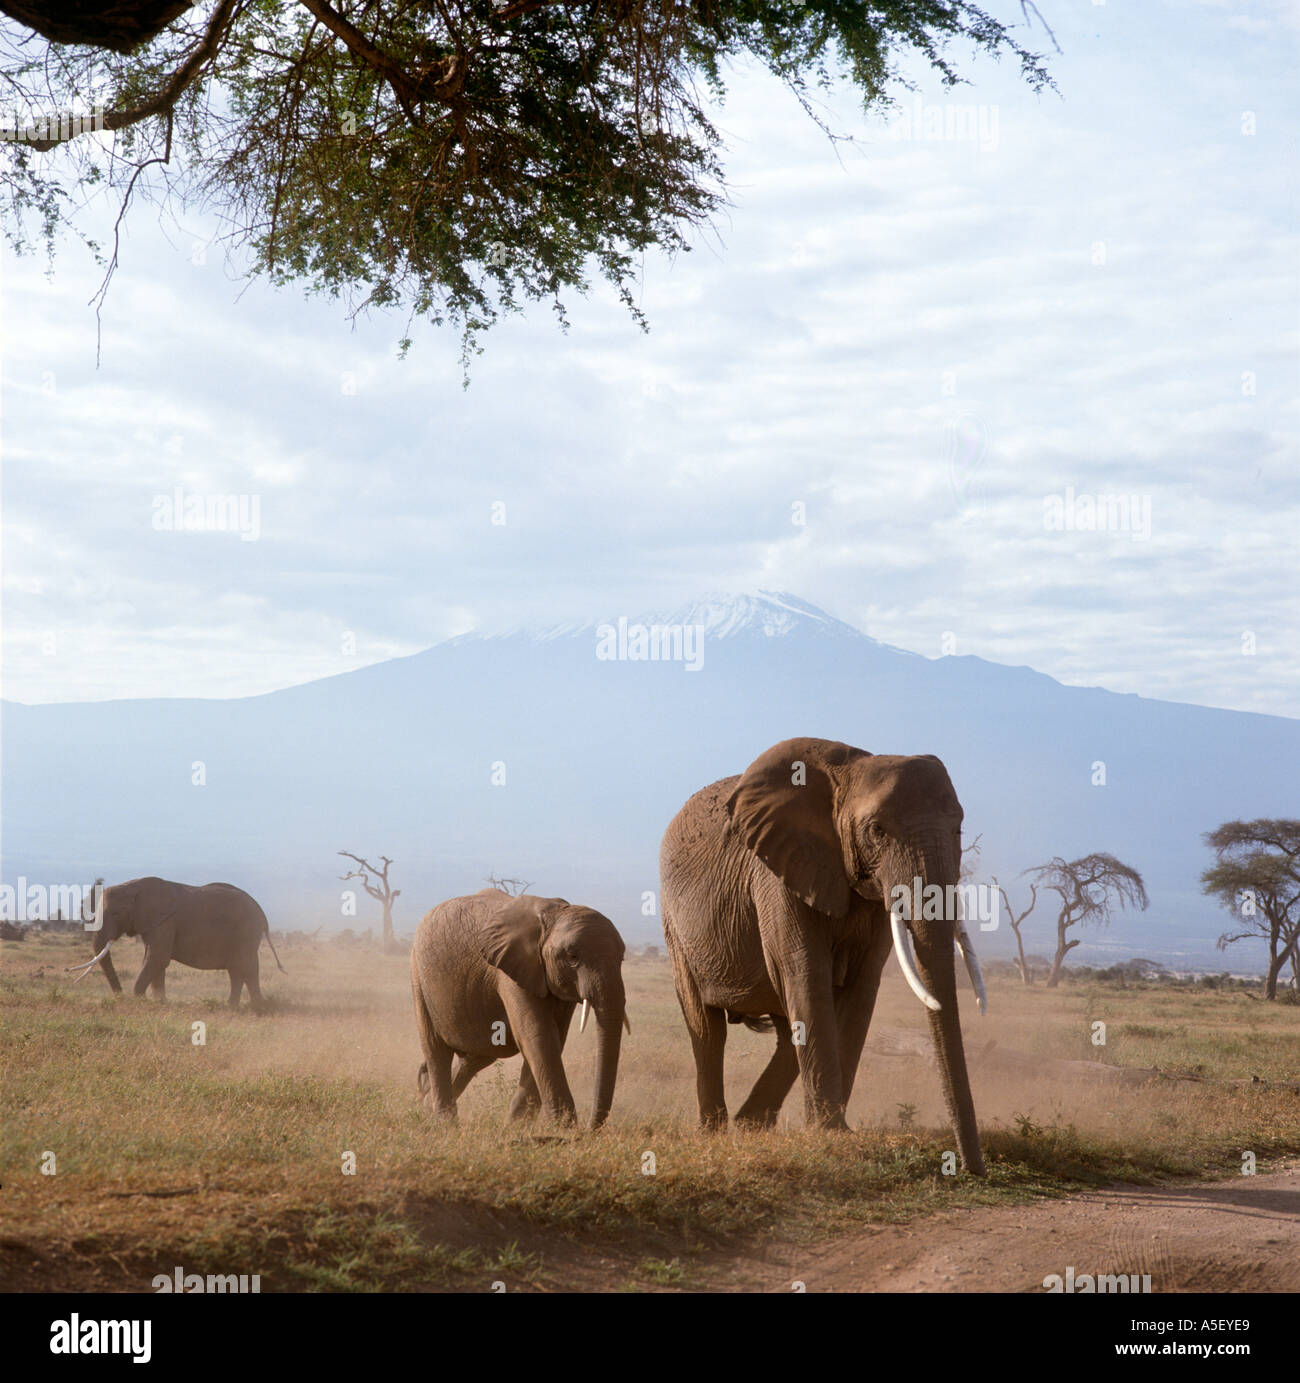 Kenya, Safari. Elephants in front of Mount Kilimanjaro, Amboseli National Park, Kenya, East Africa - Stock Image